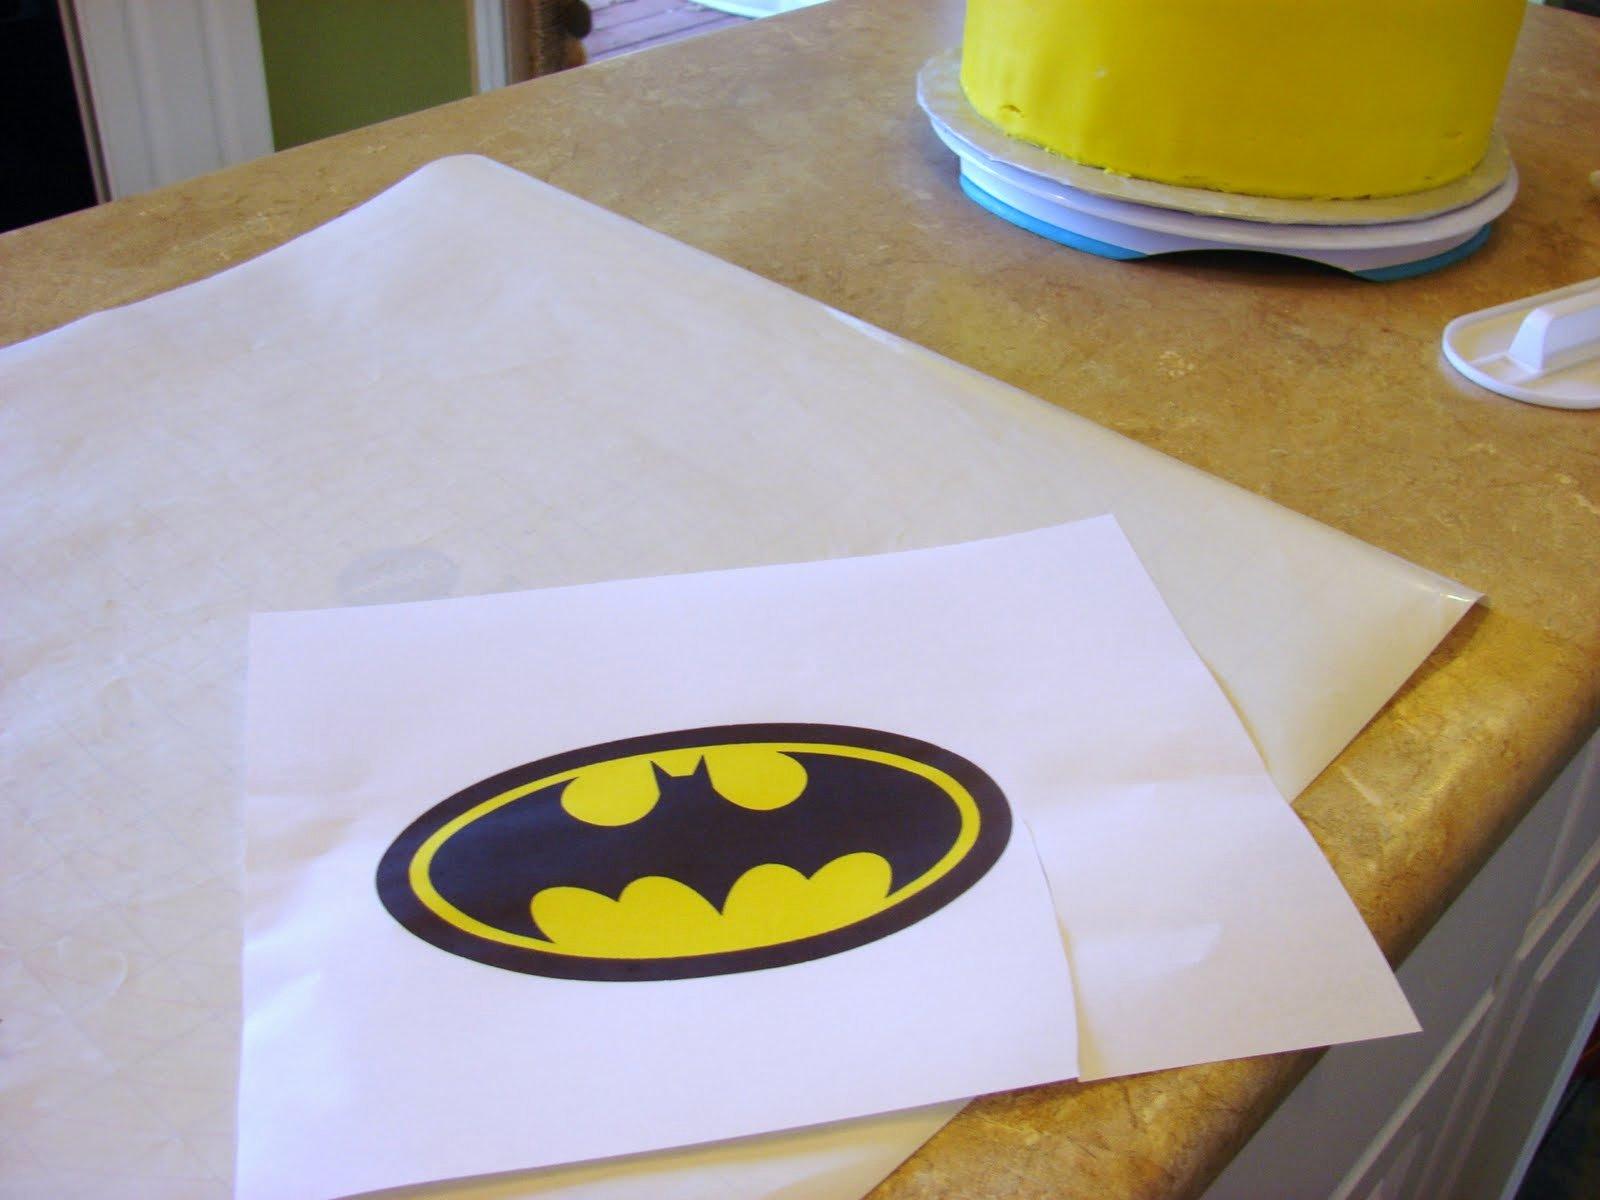 Batman Cake Template Best Of Ipsy Bipsy Bake Shop Batman Make Your Own Template